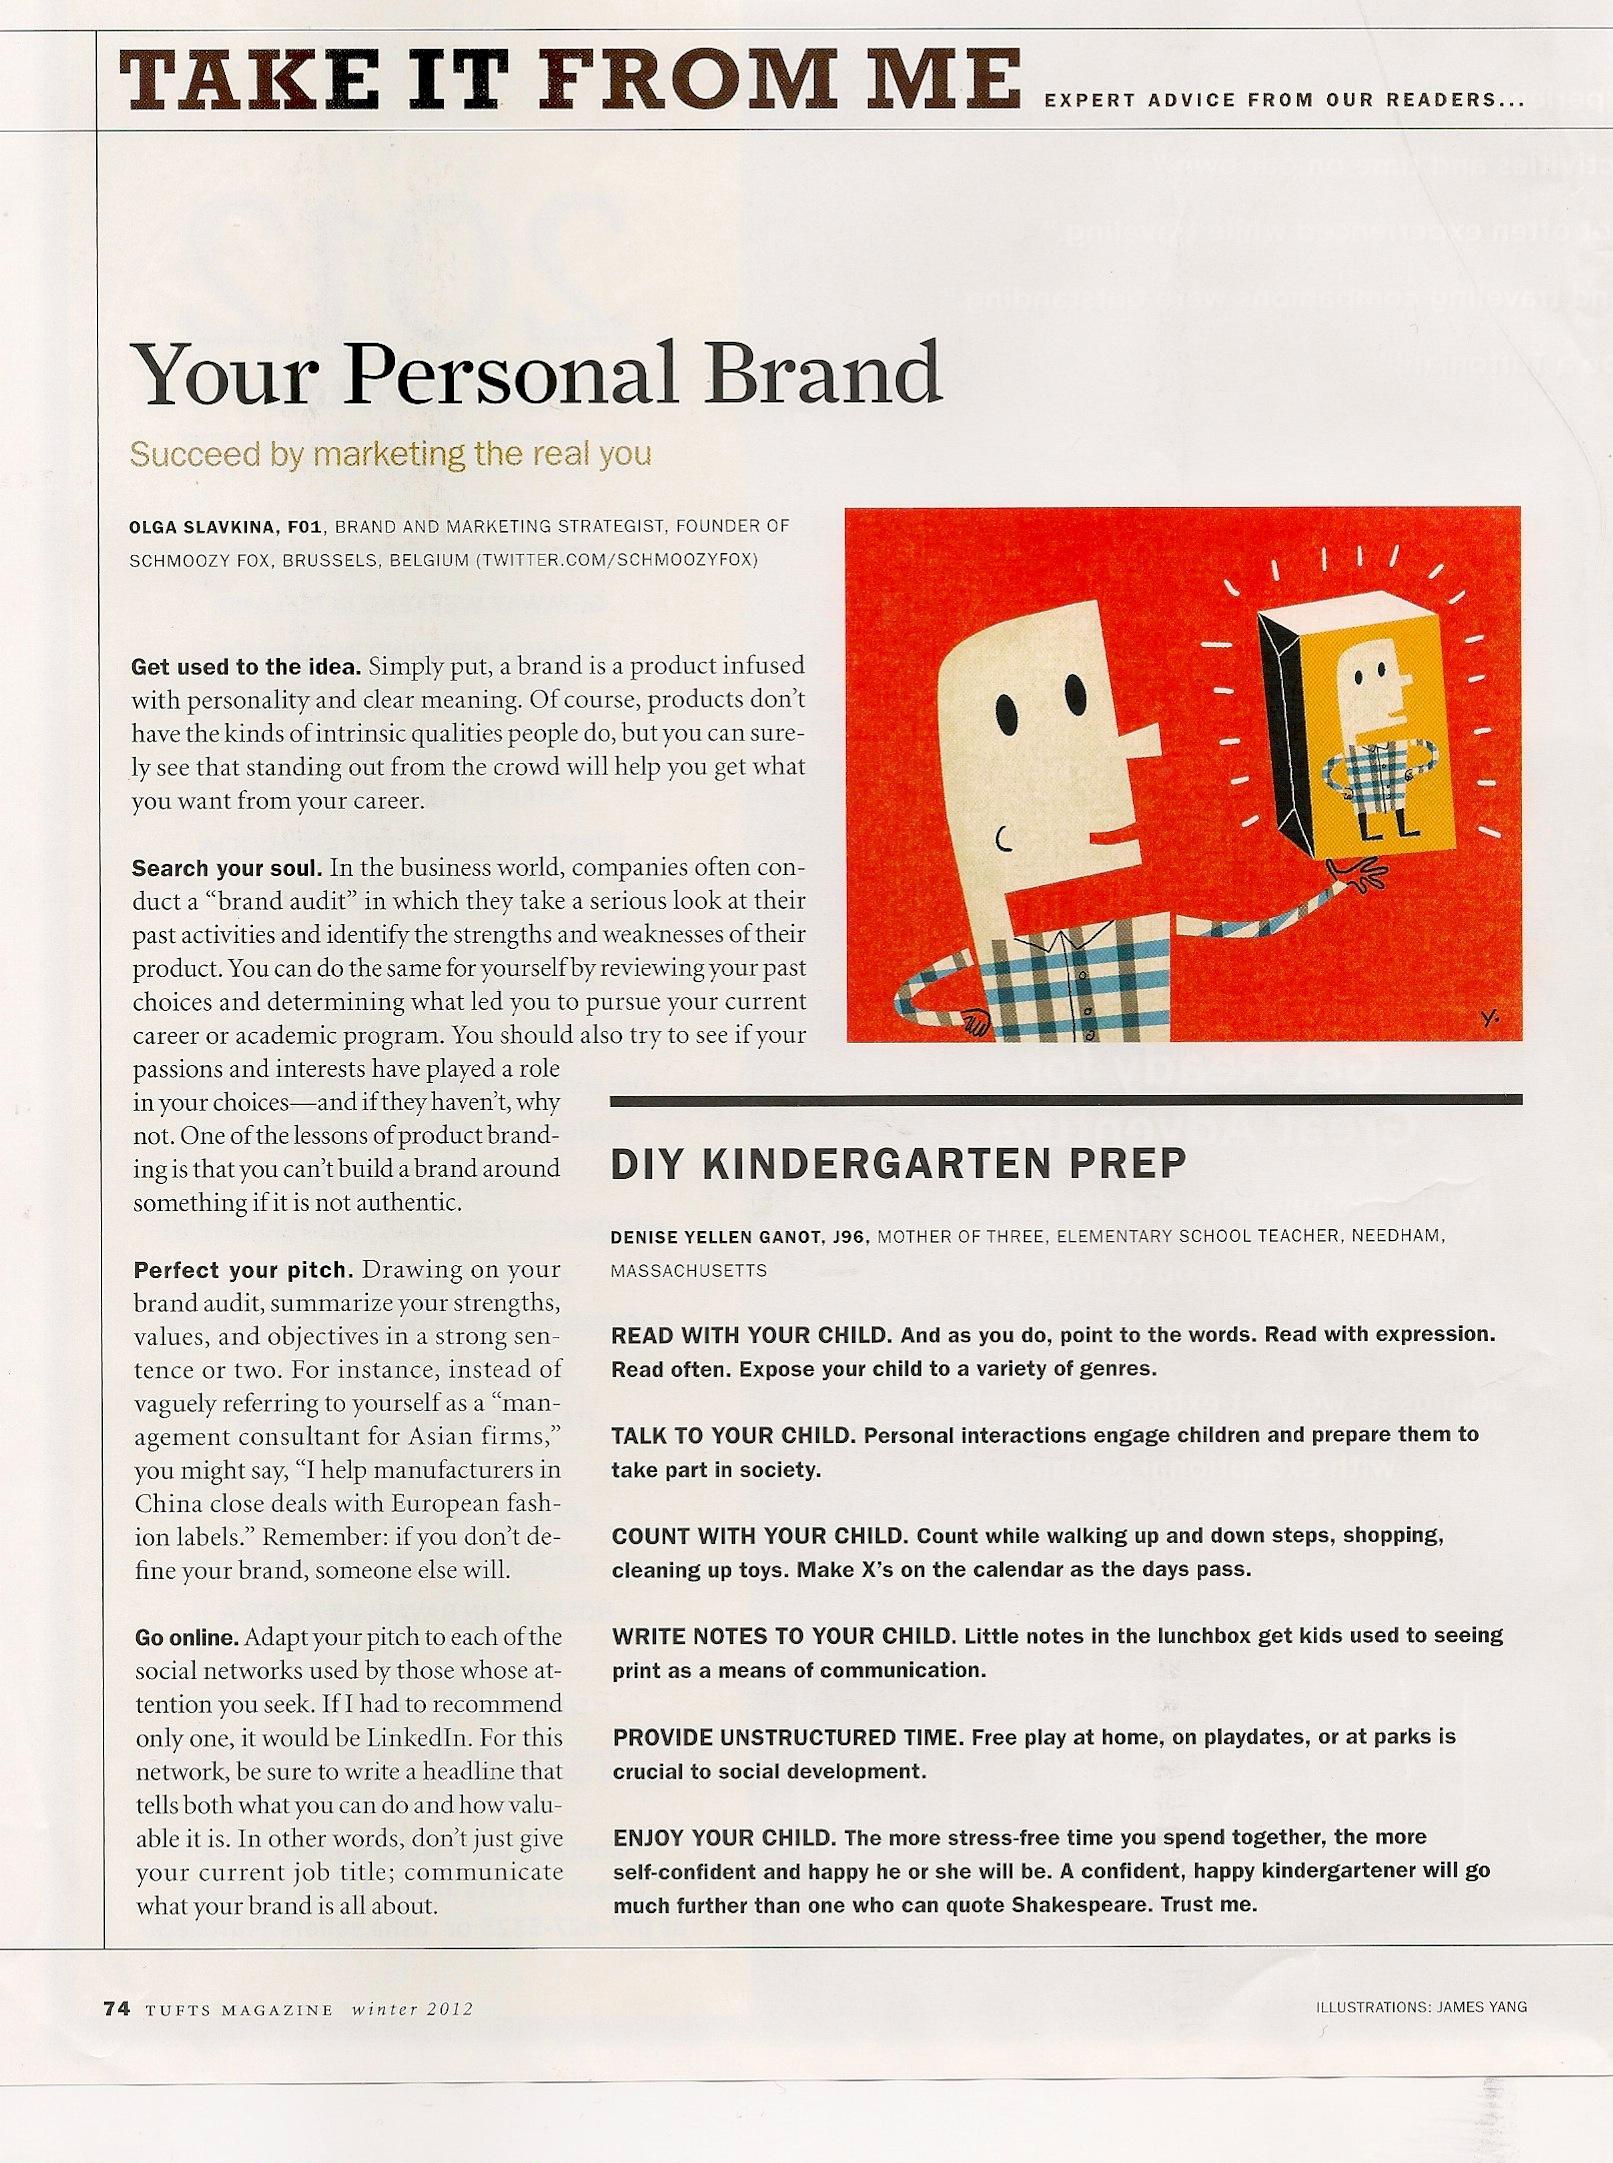 Your_Personal_Brand_article_by_Olga_Slavkina.jpg